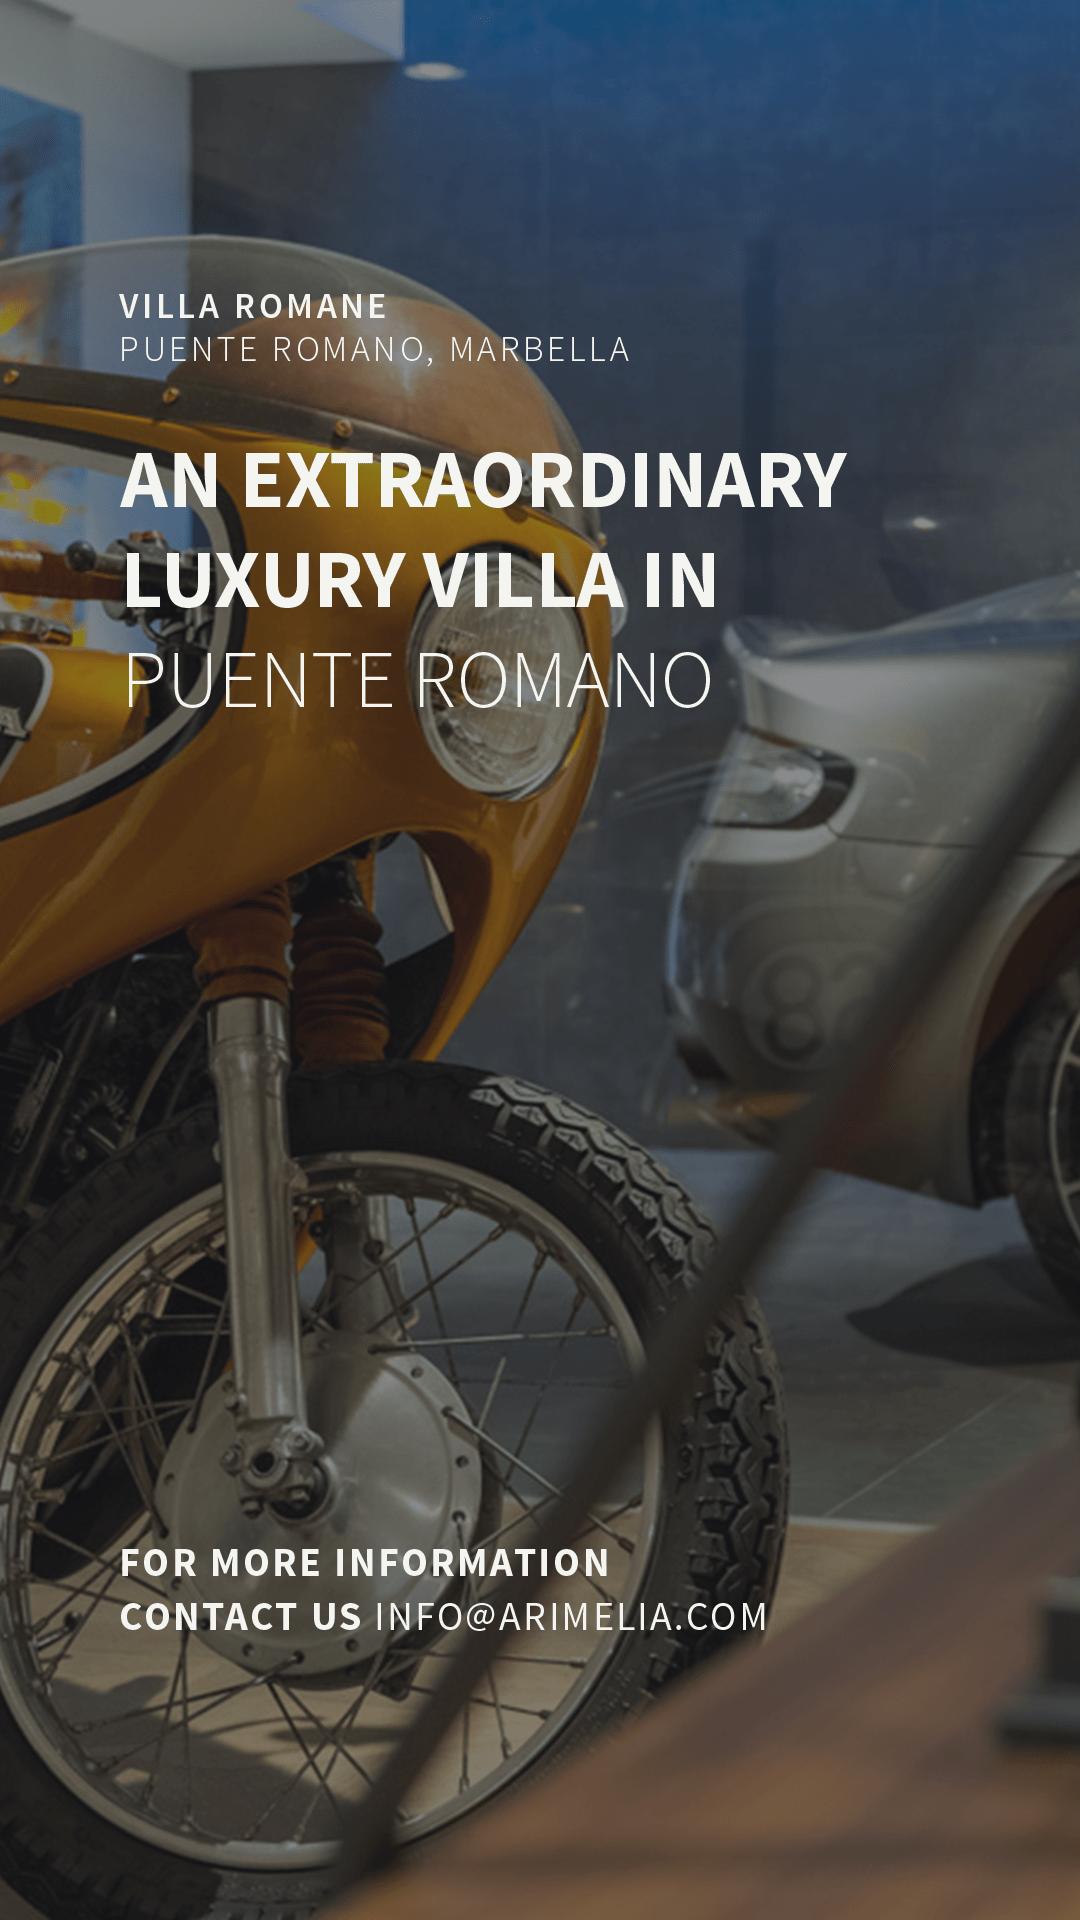 An extraordinary Luxury Villa in Puente romano Rentals Story Template